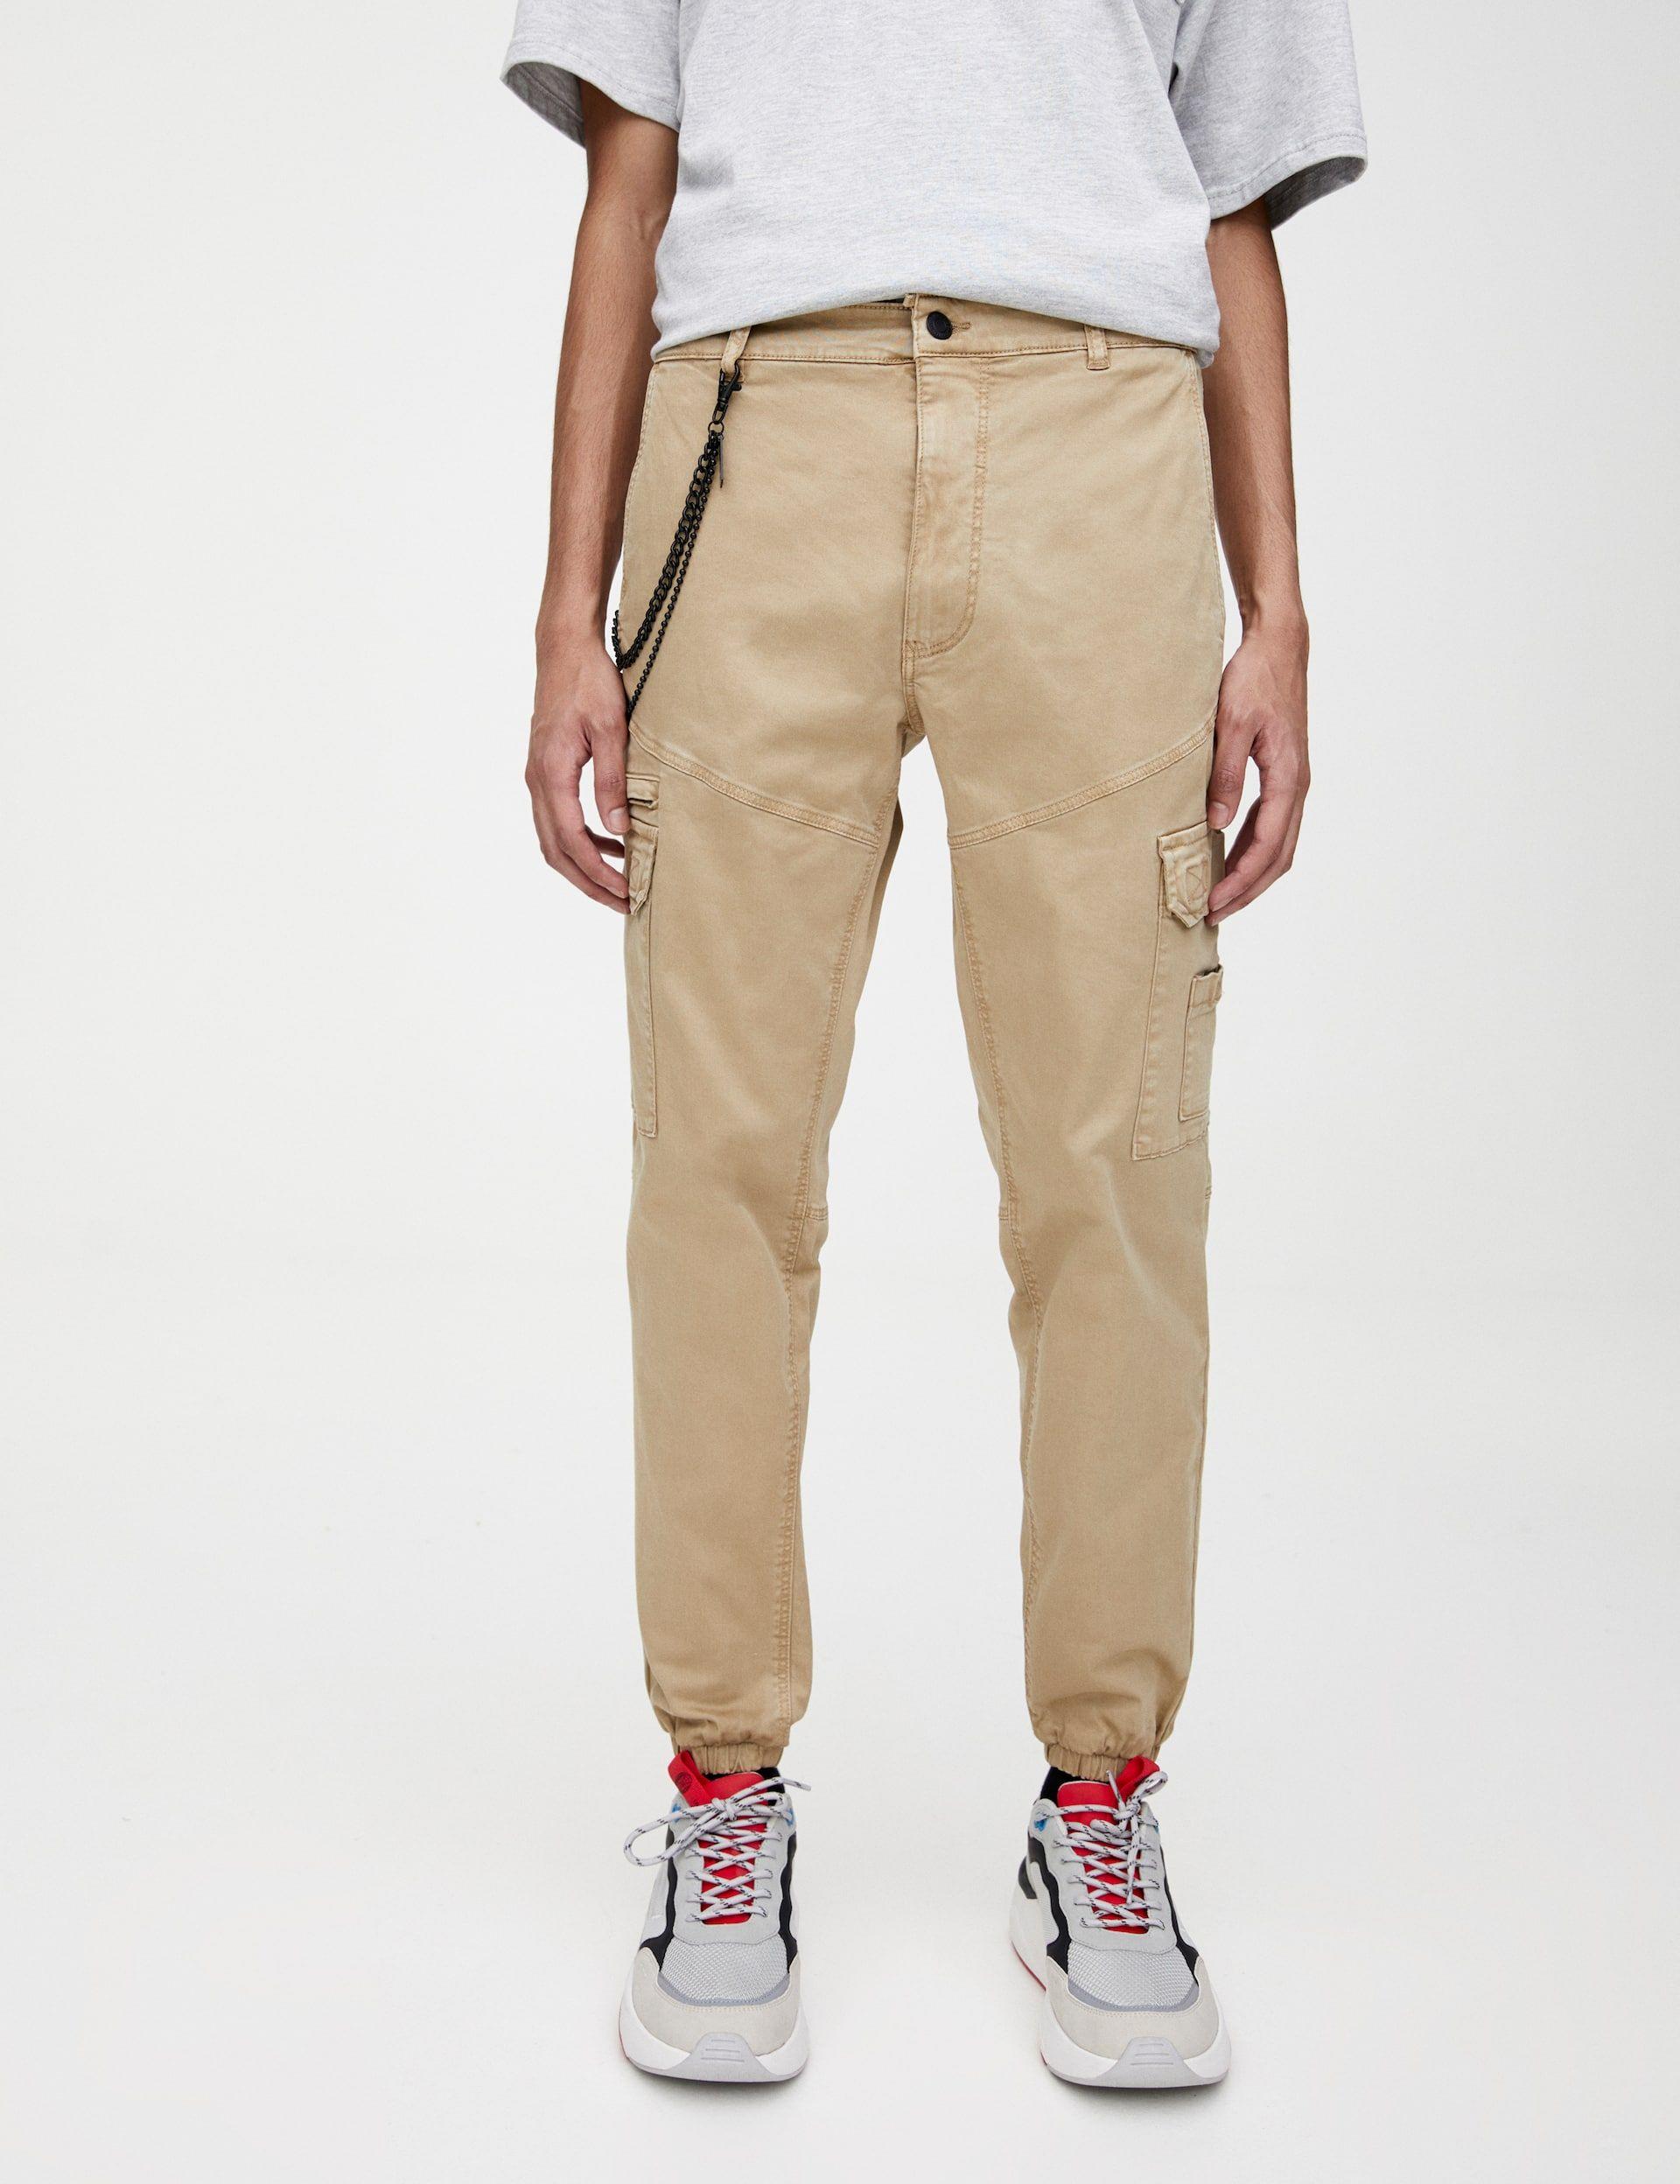 Pantalon Cargo Chino Cadena Pantalones De Moda Pantalones De Chandal Pantalones De Hombre